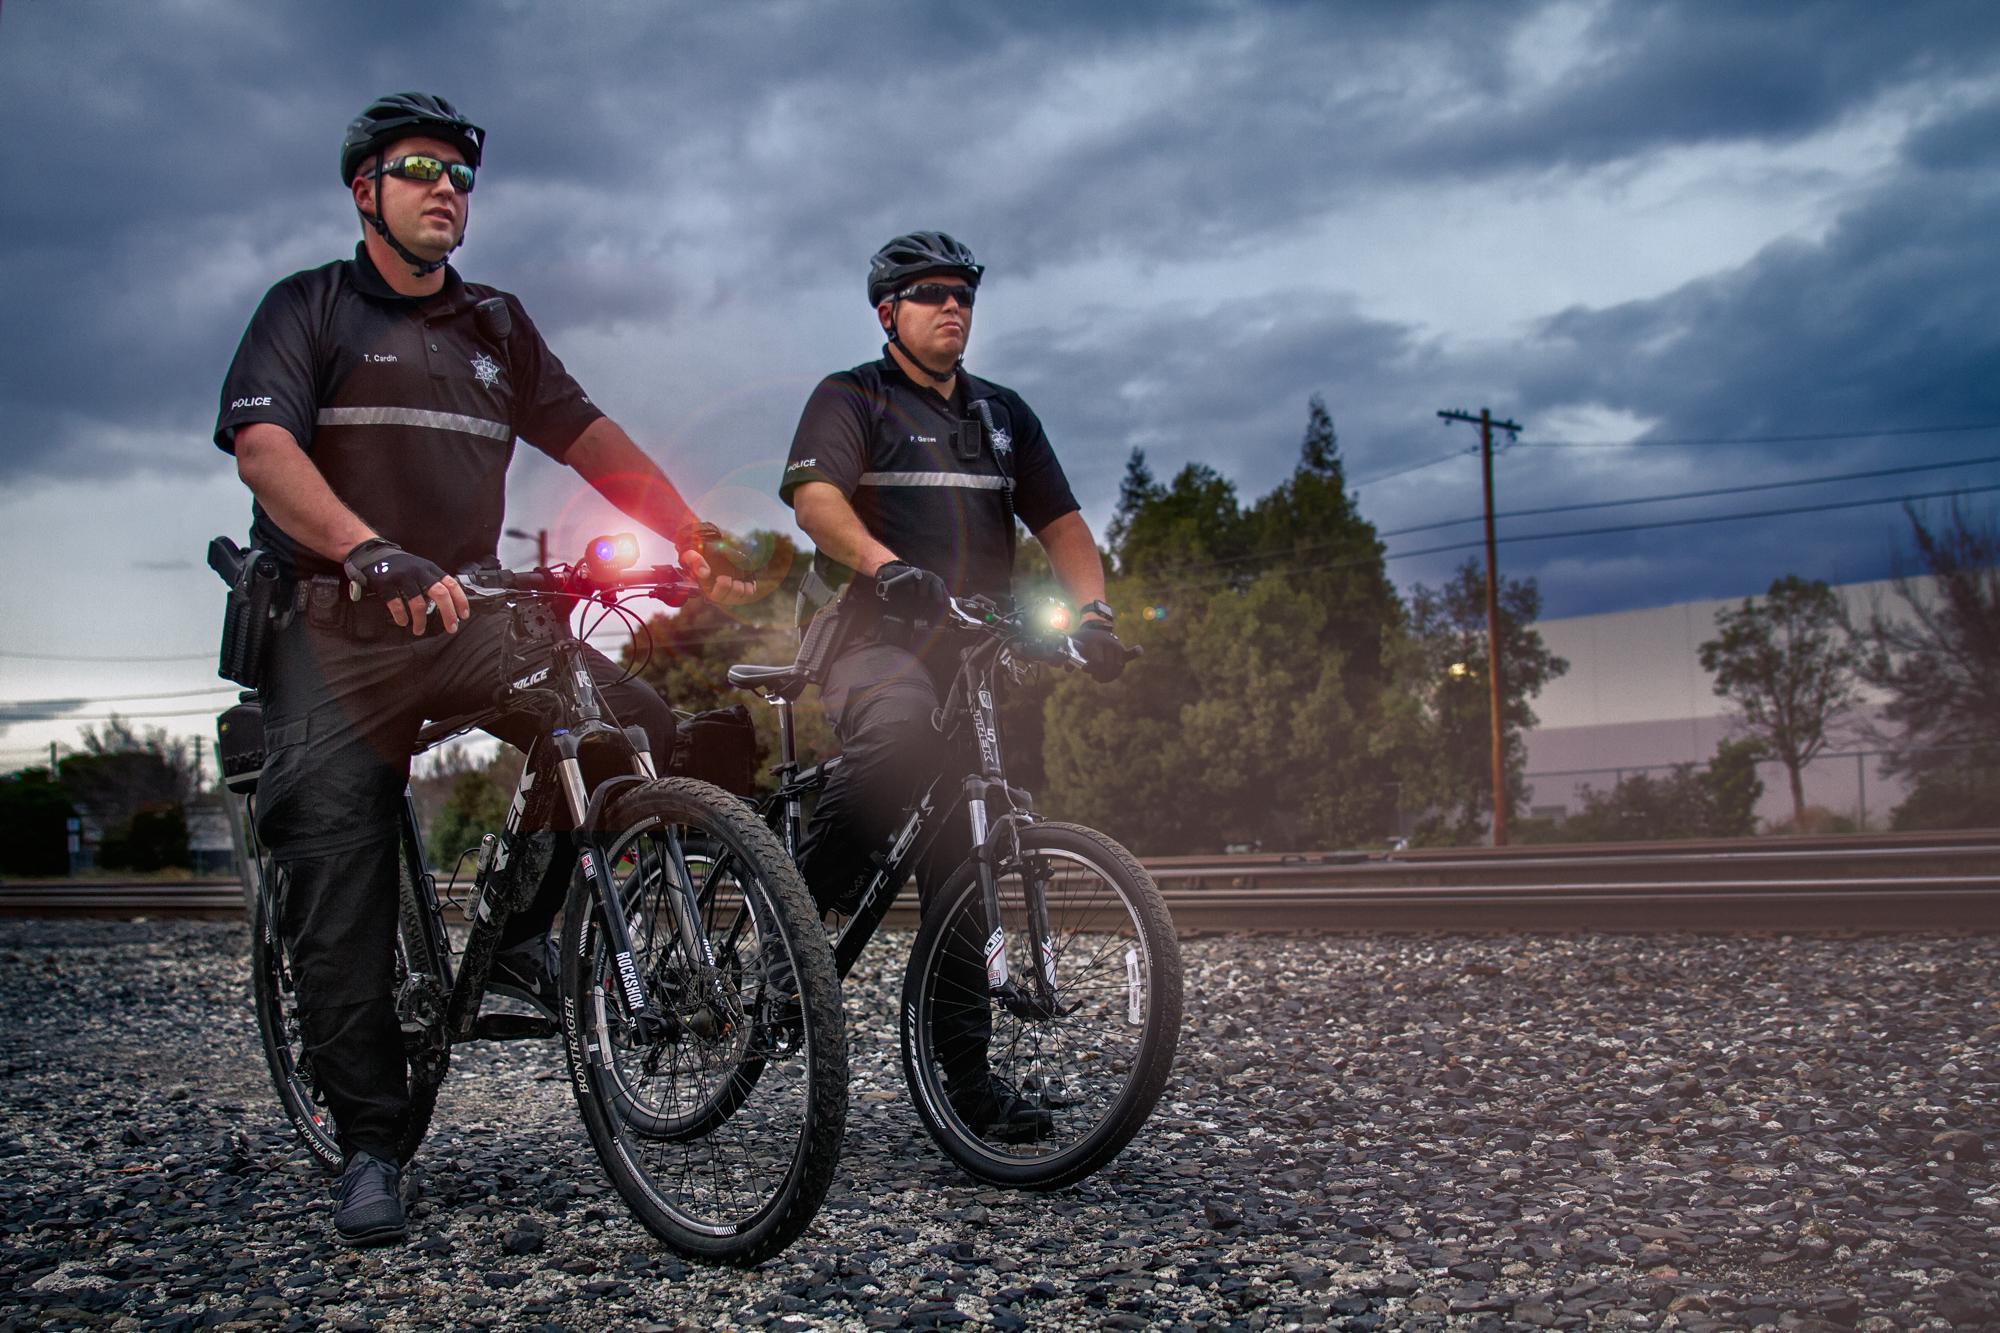 SCPD_Bikes-1.jpg